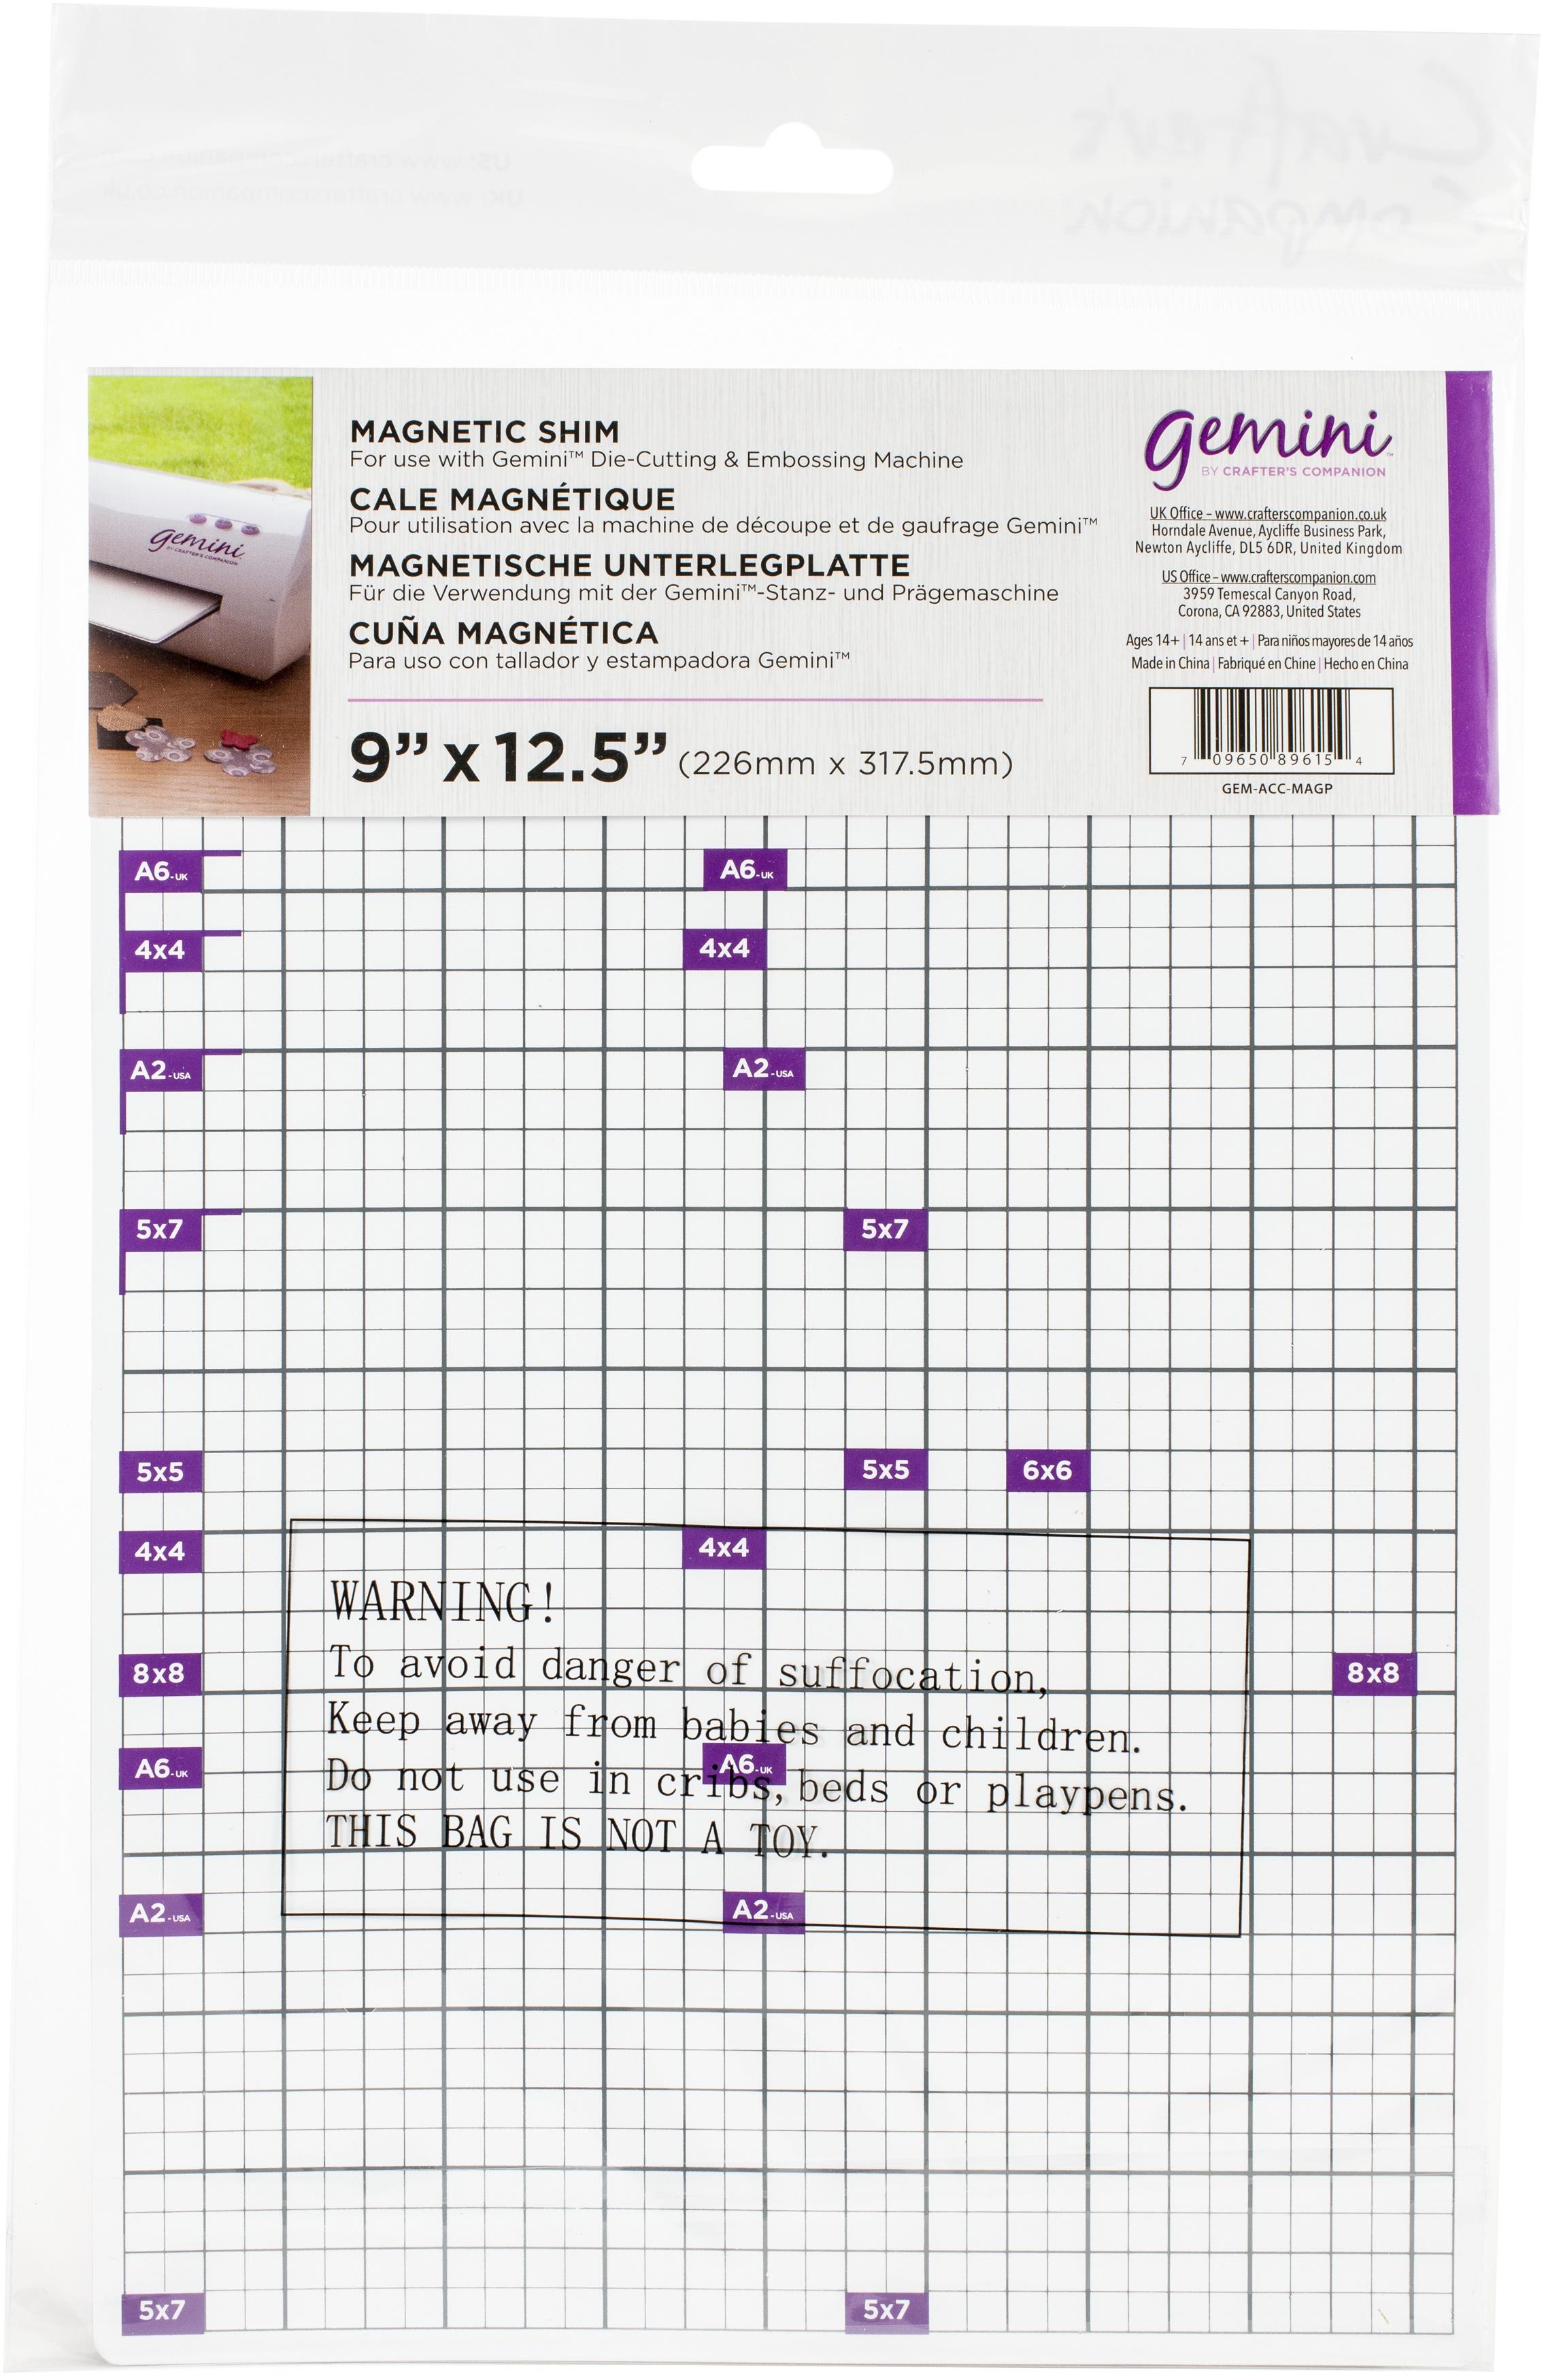 Crafter's Companion Gemini Magnetic Shim 9'x12.5'